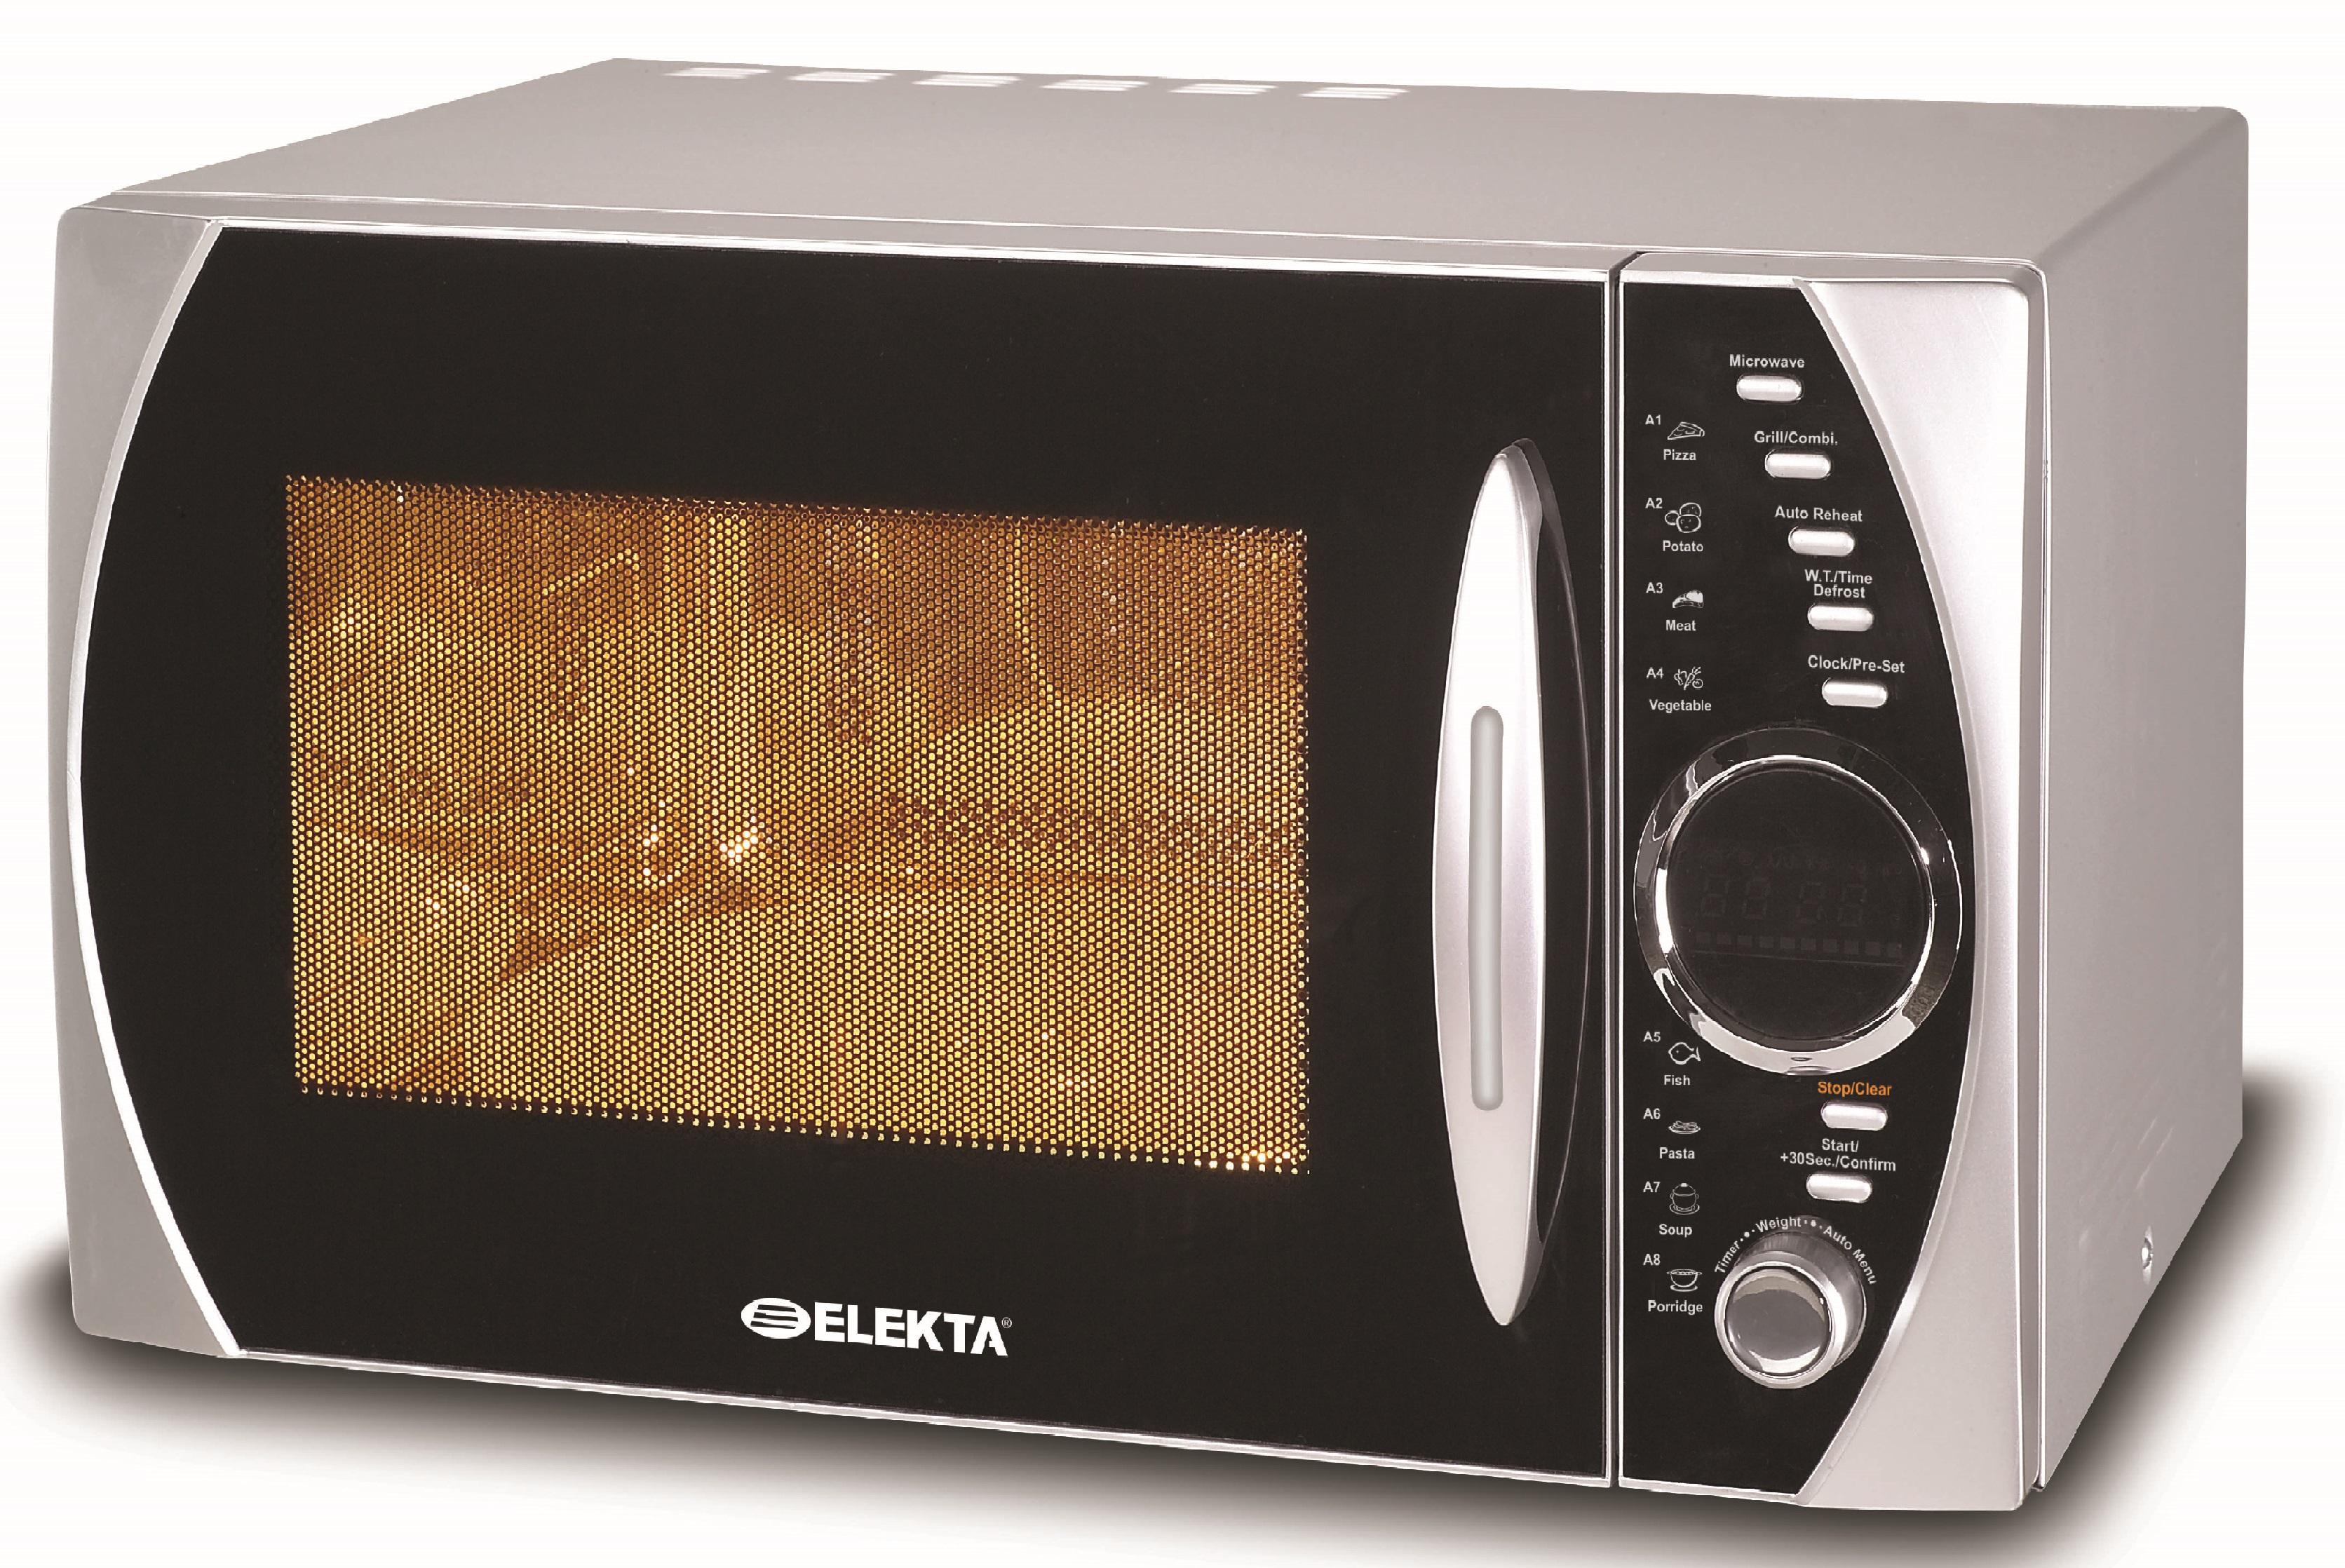 Elekta Microwave Oven, EMO-635GC